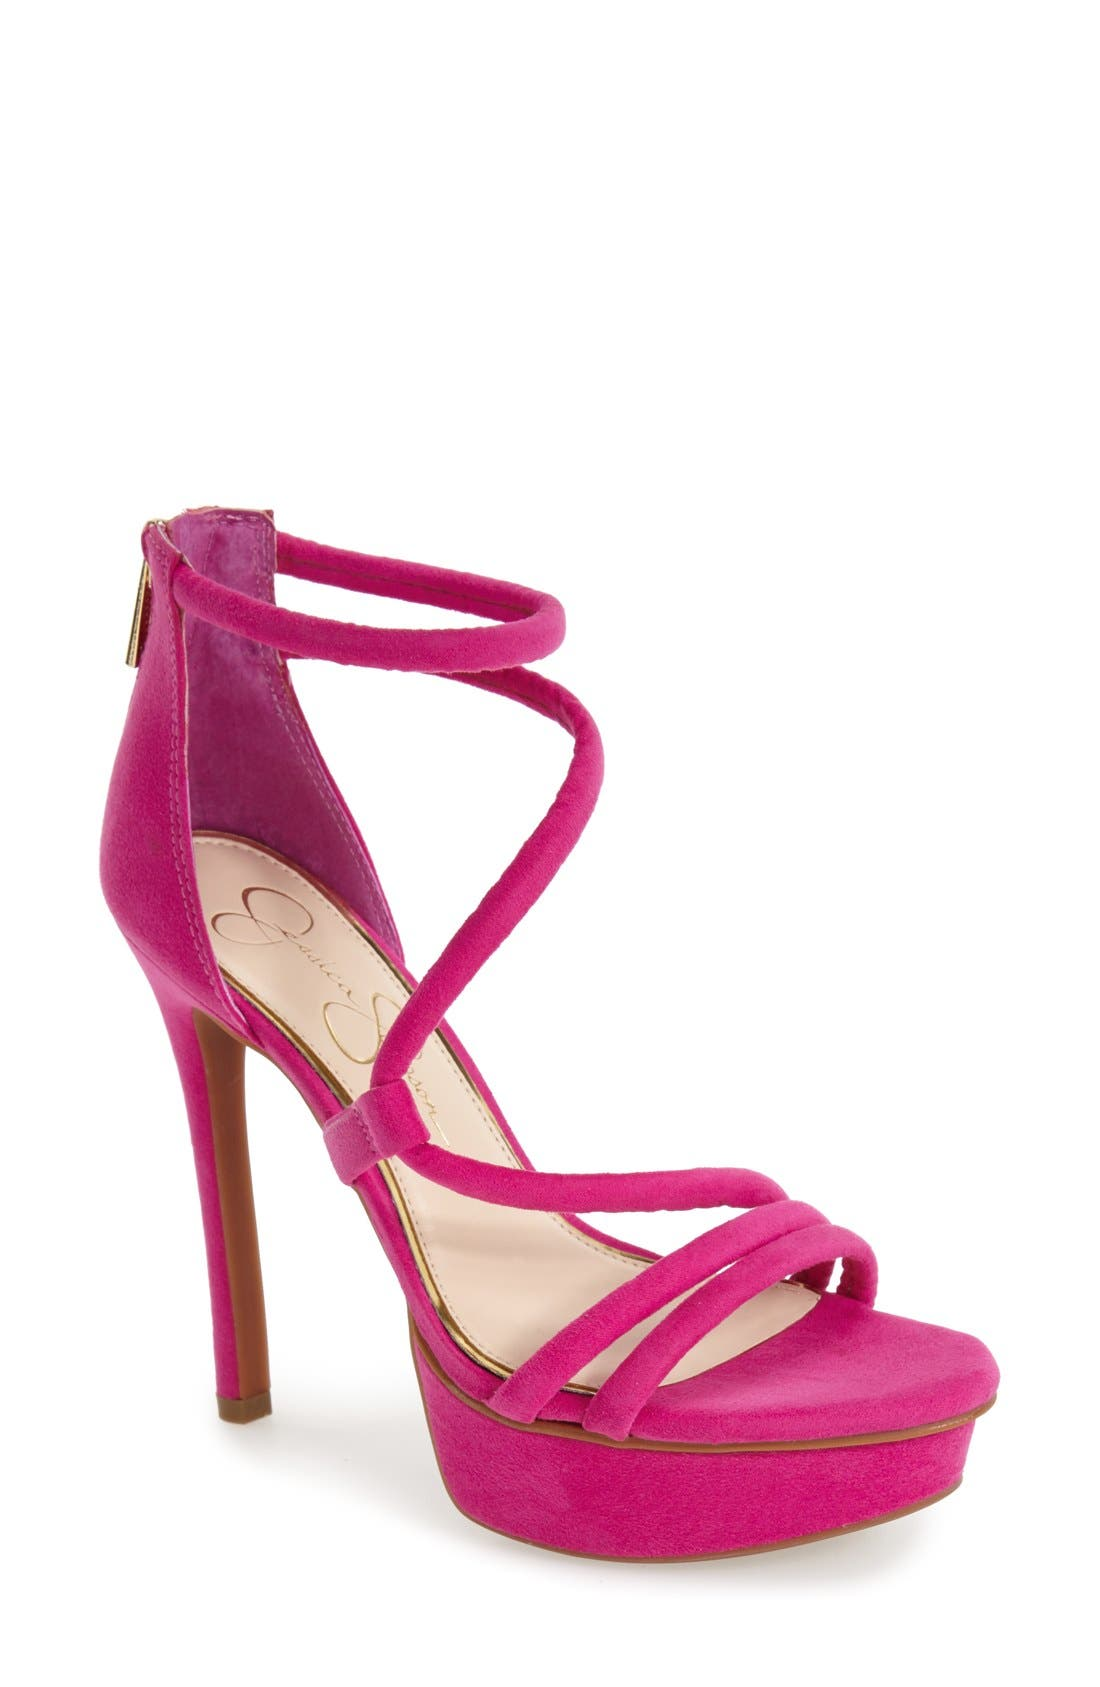 Alternate Image 1 Selected - Jessica Simpson 'Caela' Platform Sandal (Women)